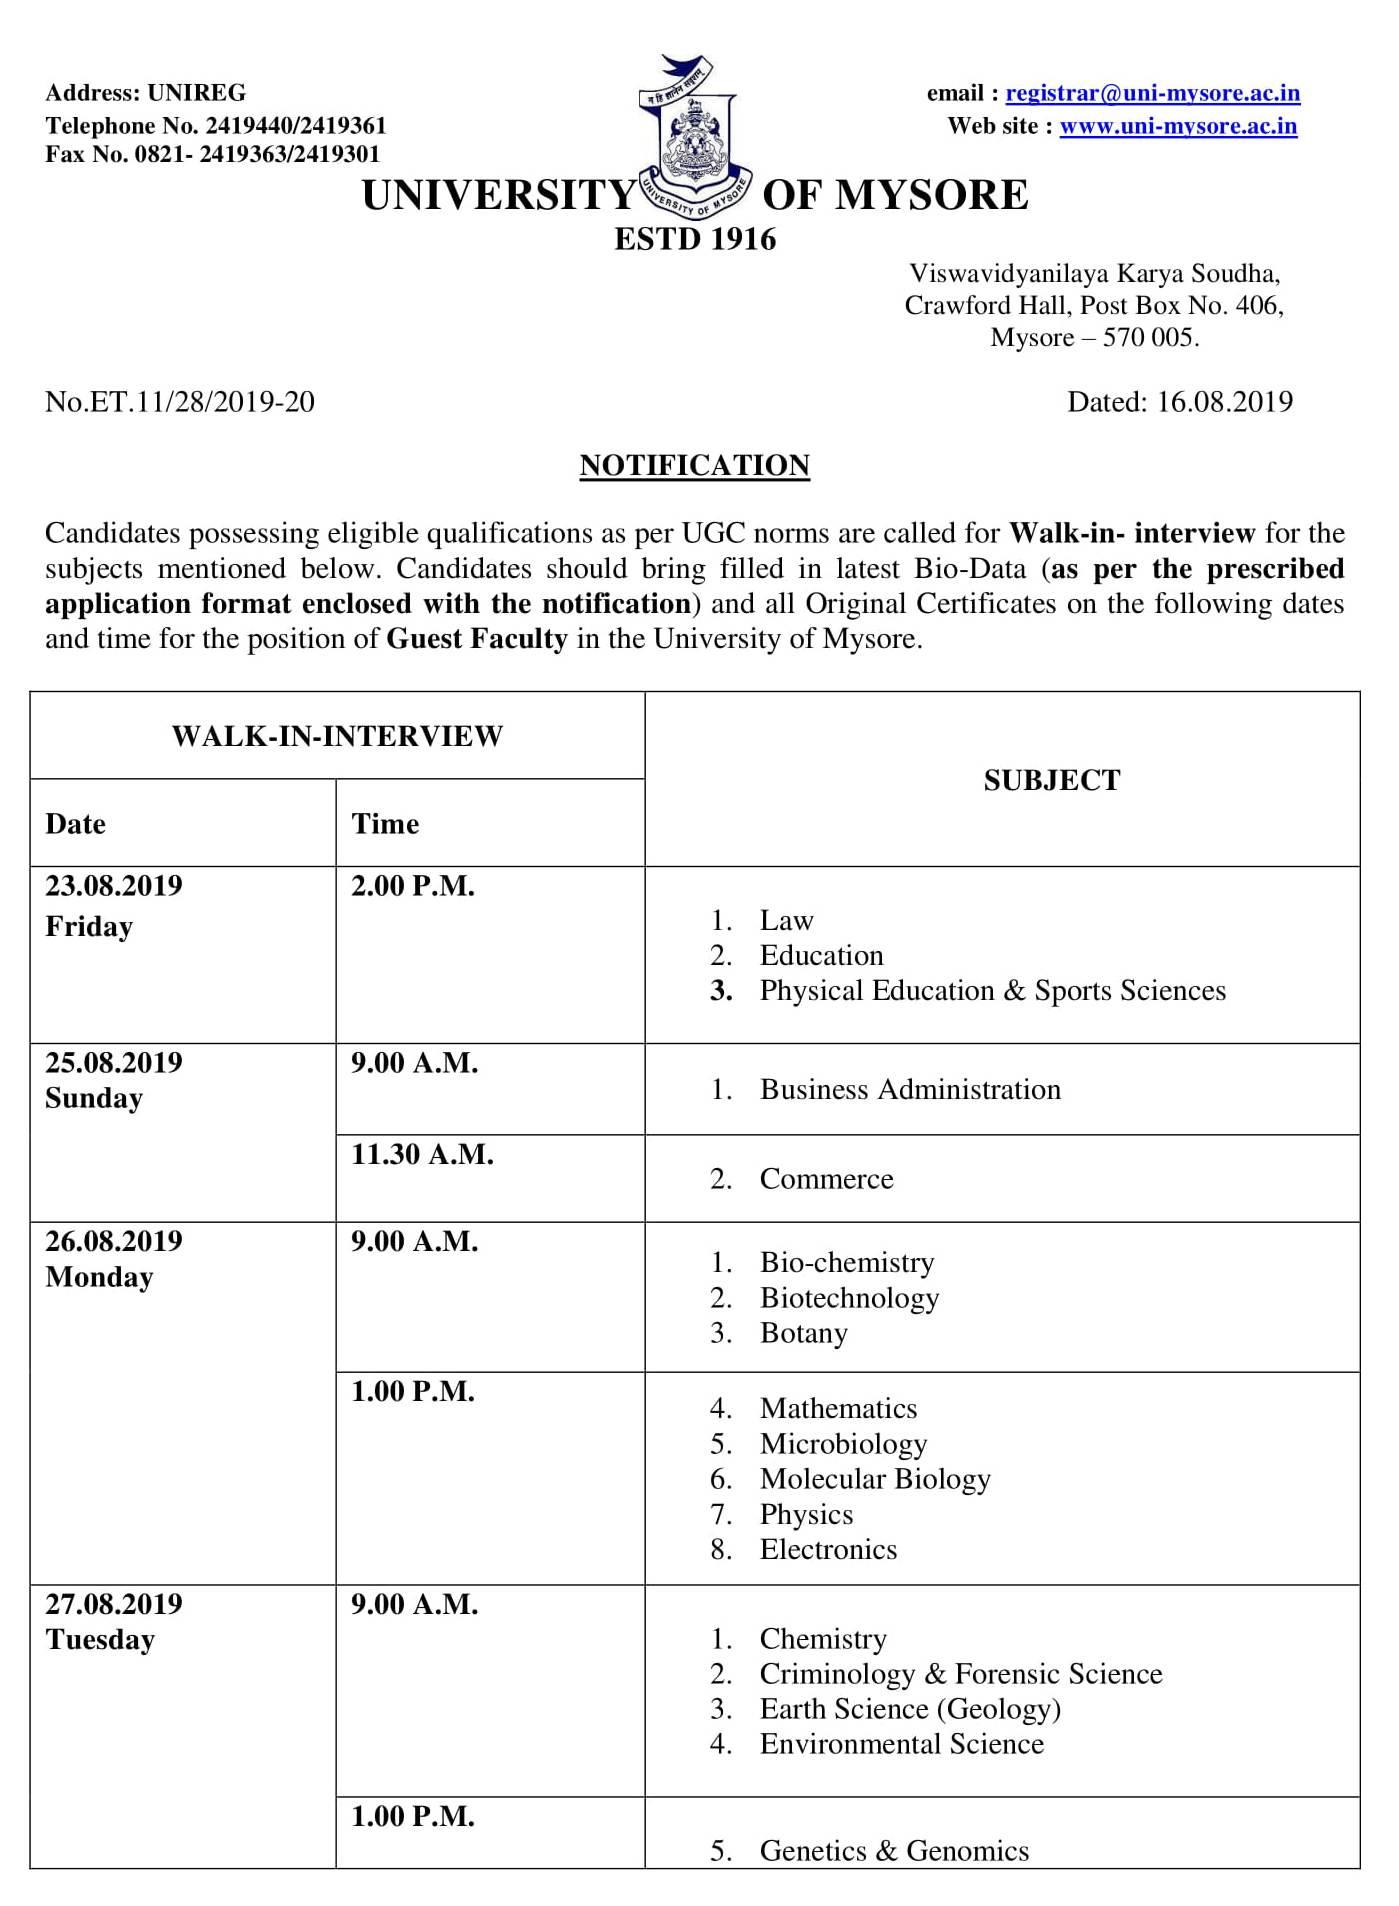 guest_faculty_notification_2019-20-1.jpg